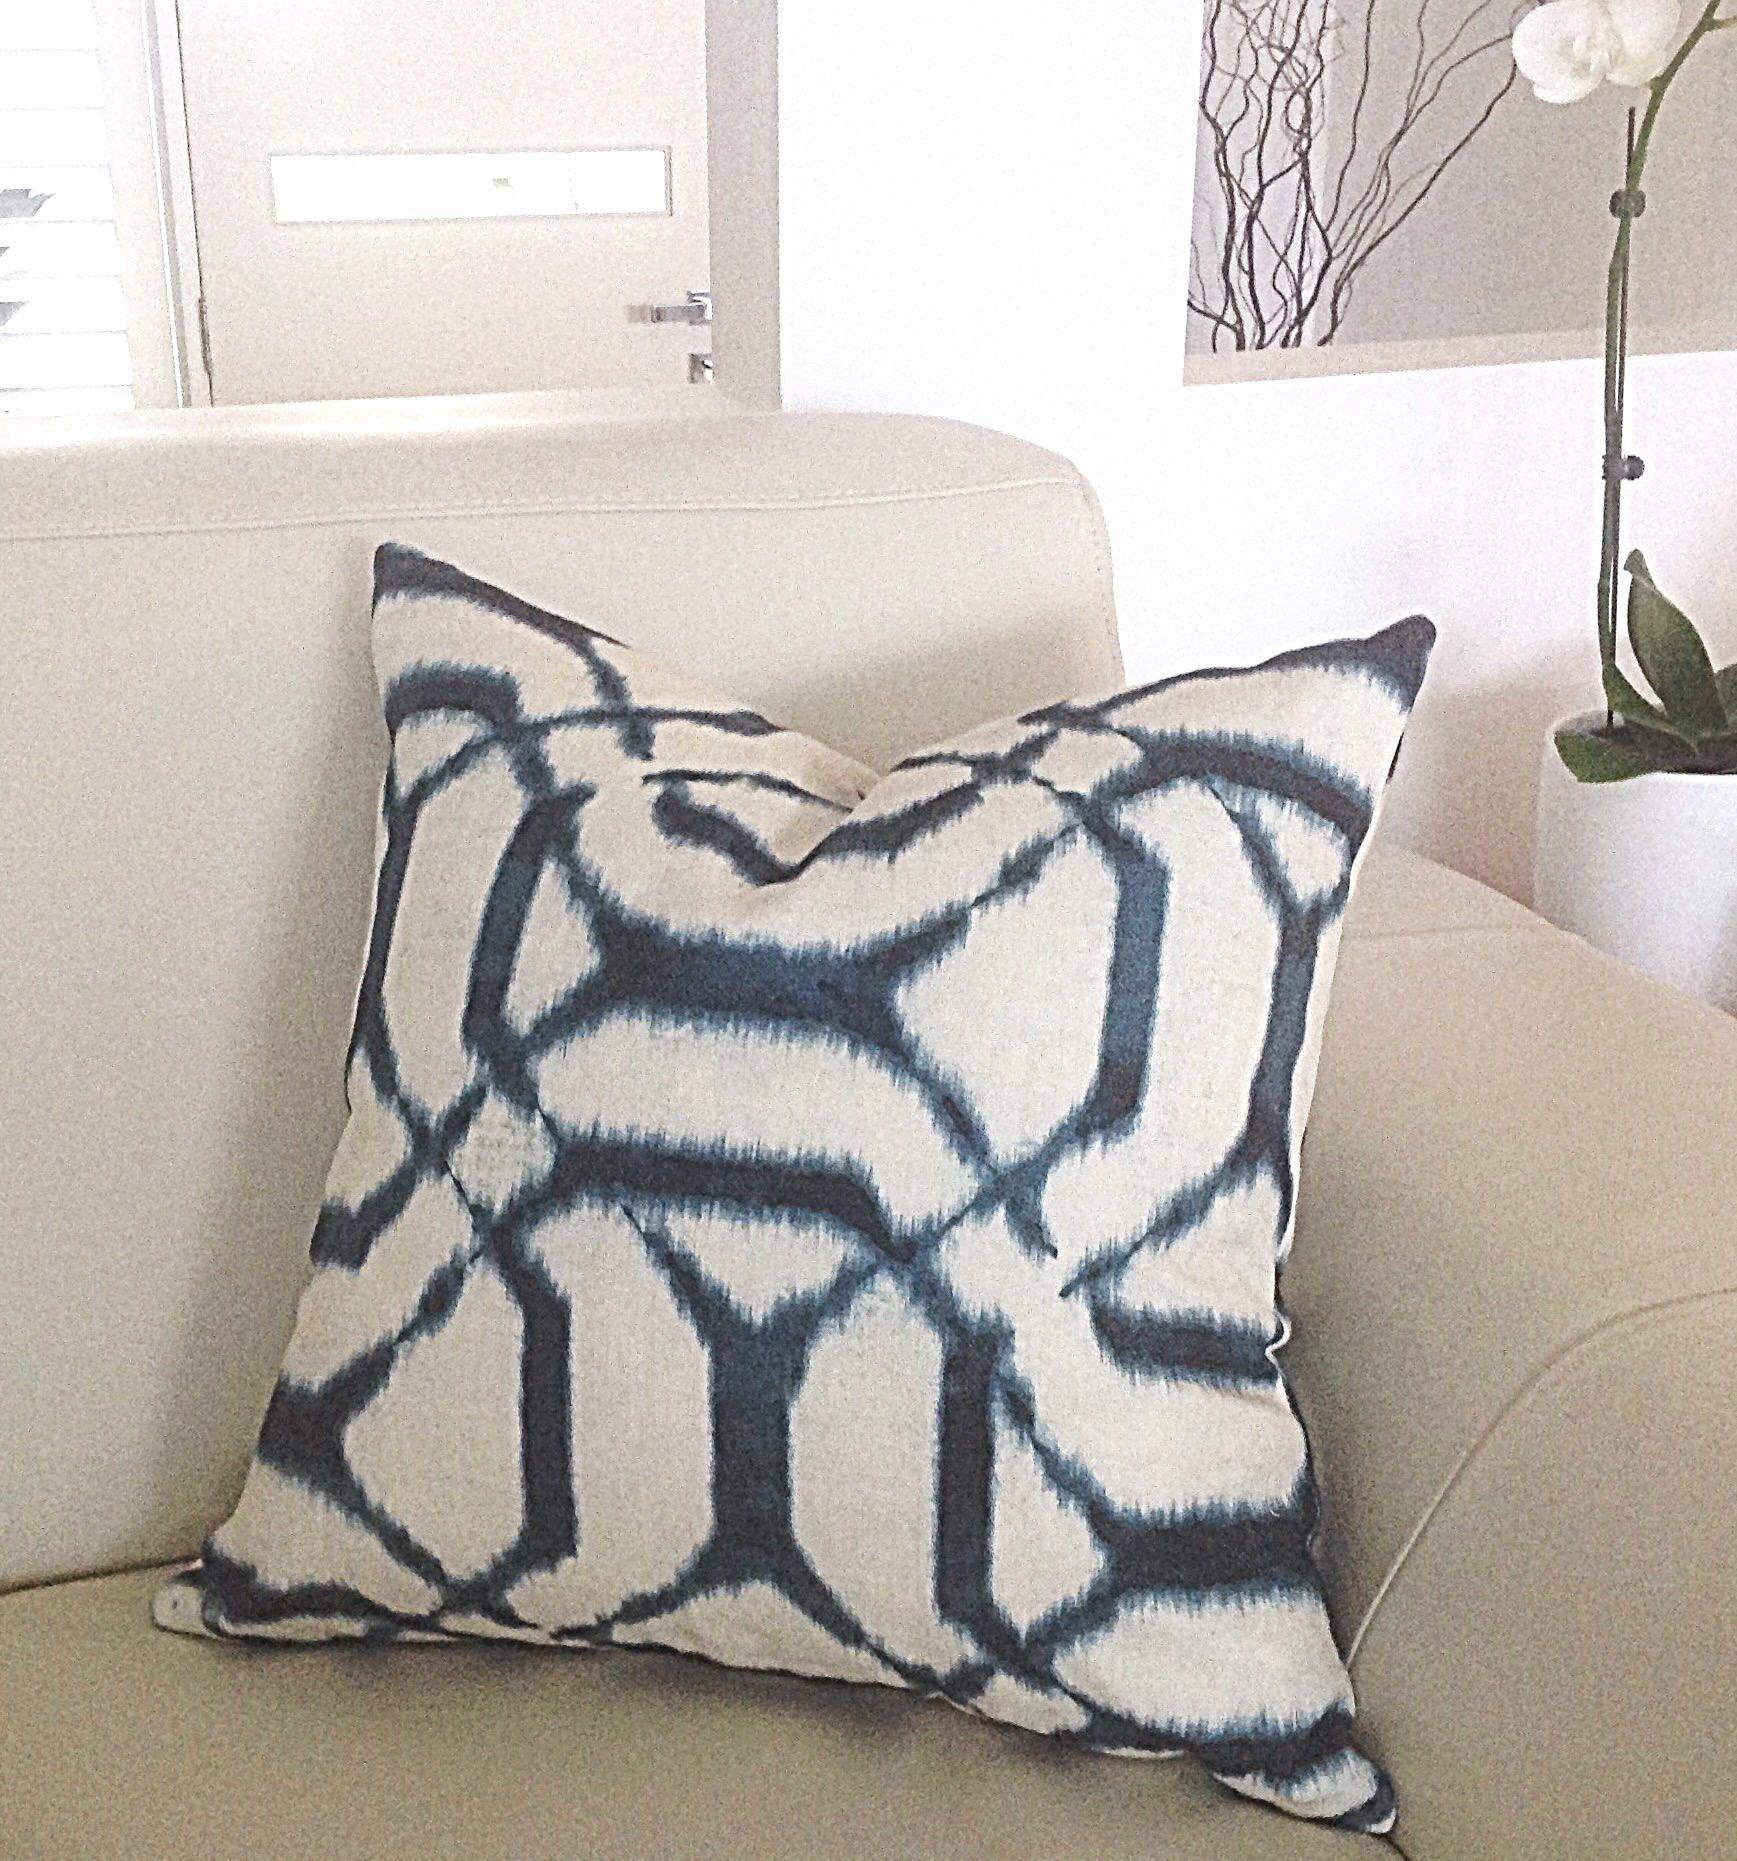 cushions pillows blue cushion covers jepeto denim shibori style  - cushions pillows blue cushion covers jepeto denim shibori style moderntoss pillows scatter cushions toss pillow covers only